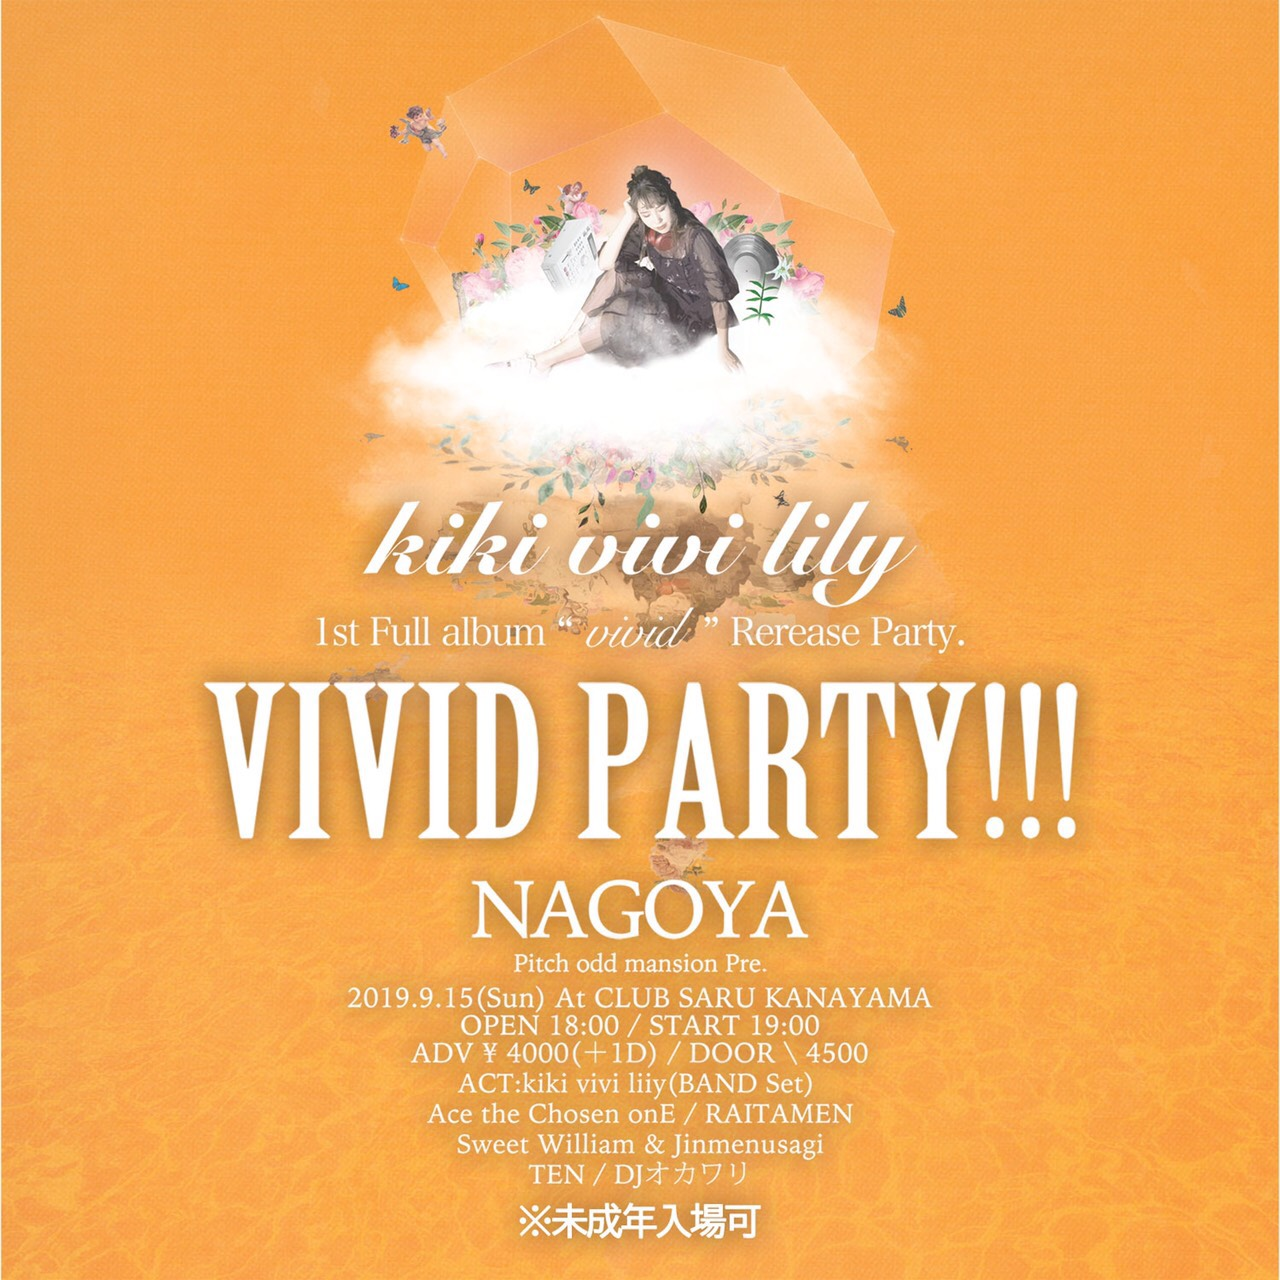 vivid_party_nagoya.jpg